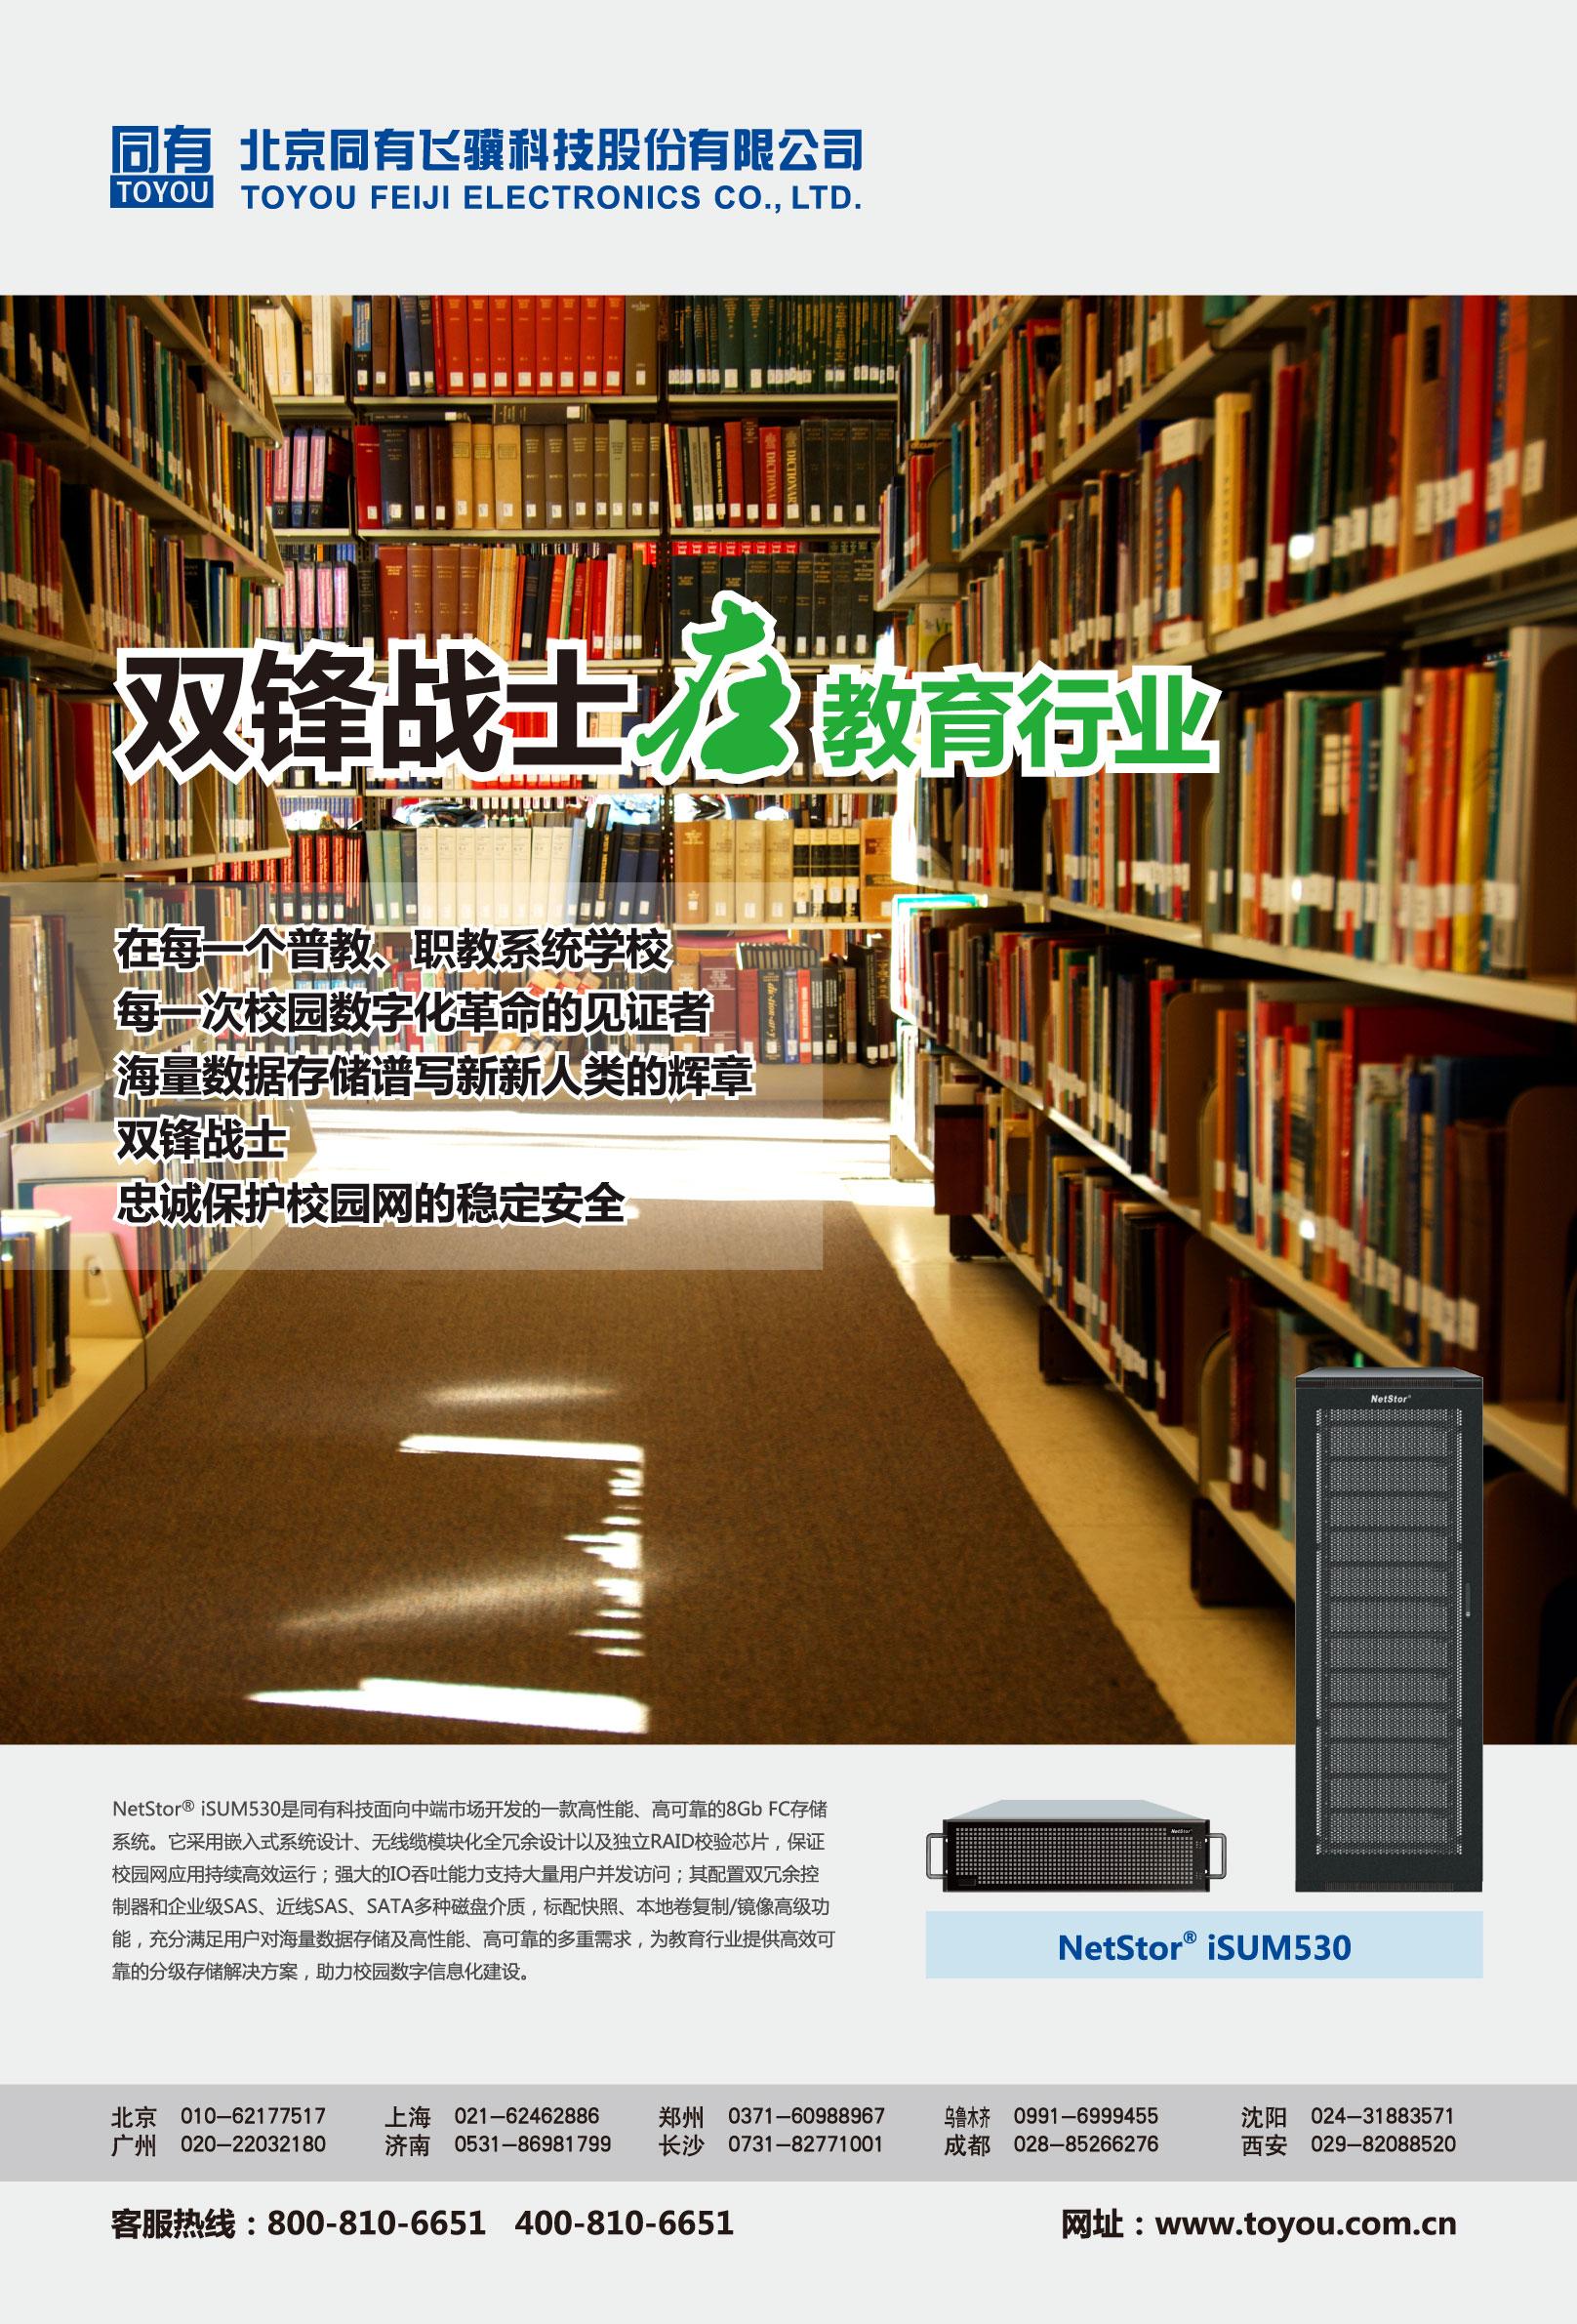 NetStor iSUM530在教育行业